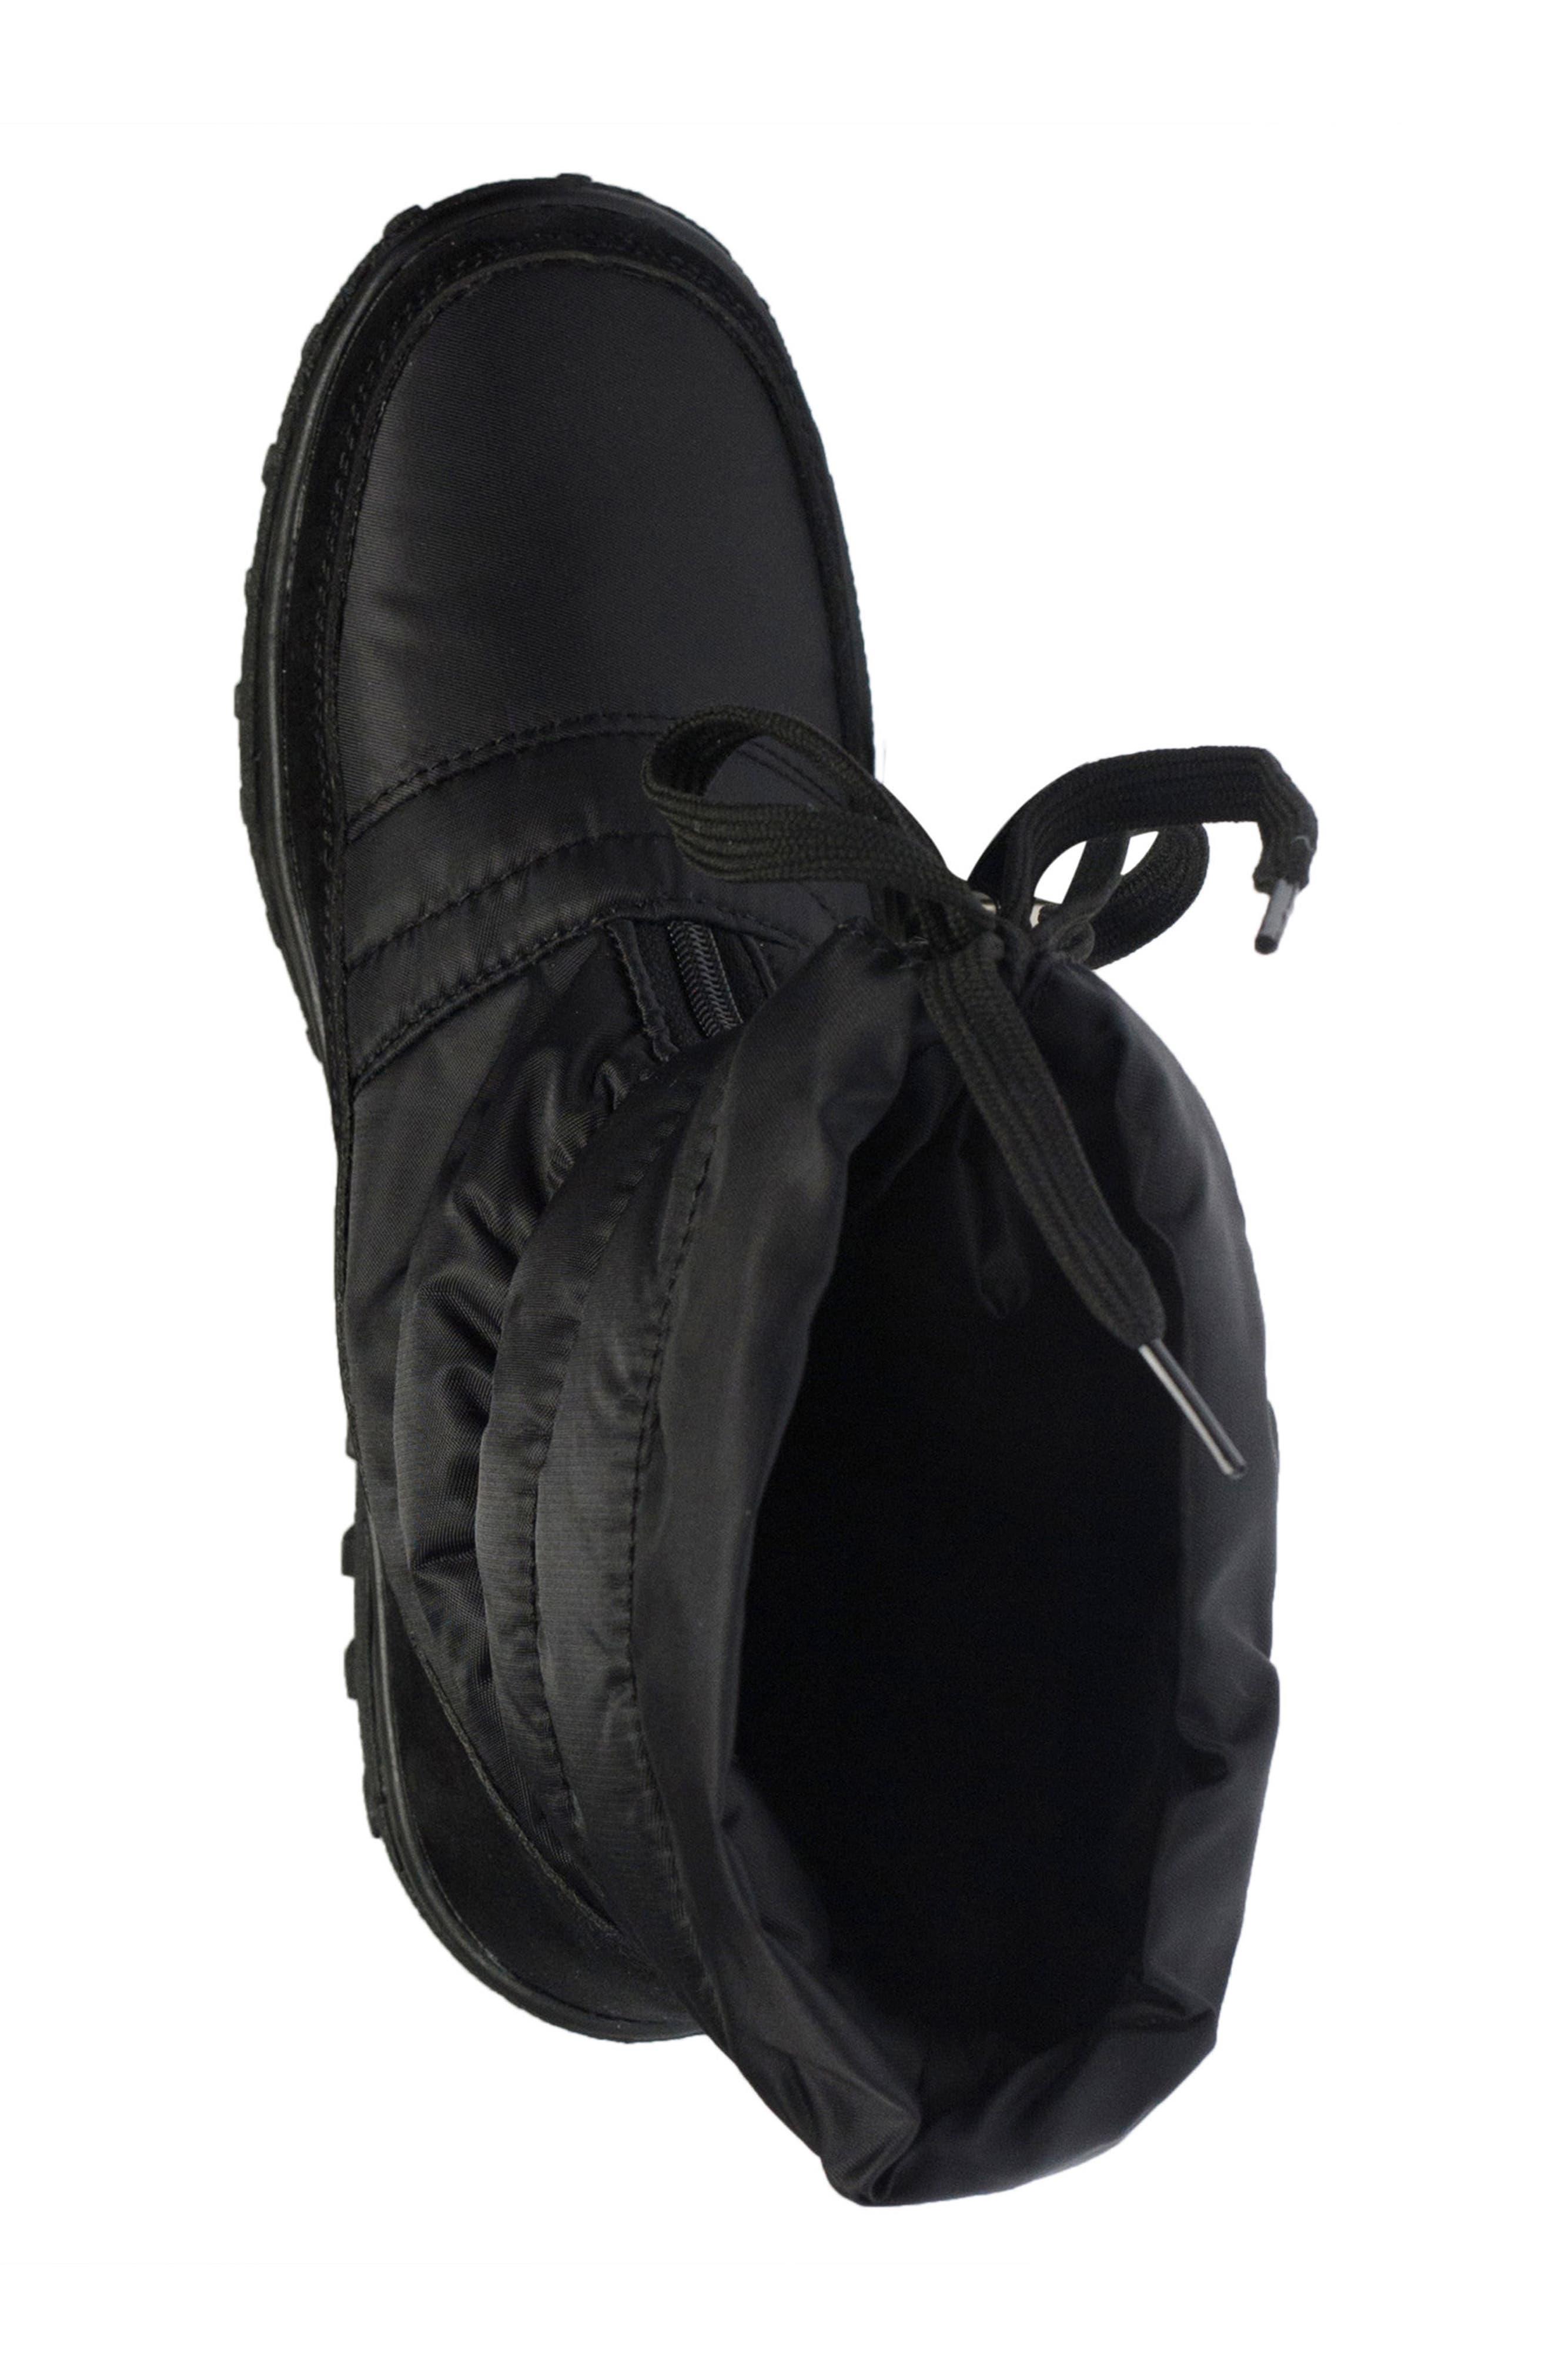 Lucerne Waterproof Drawstring Boot,                             Alternate thumbnail 4, color,                             Black